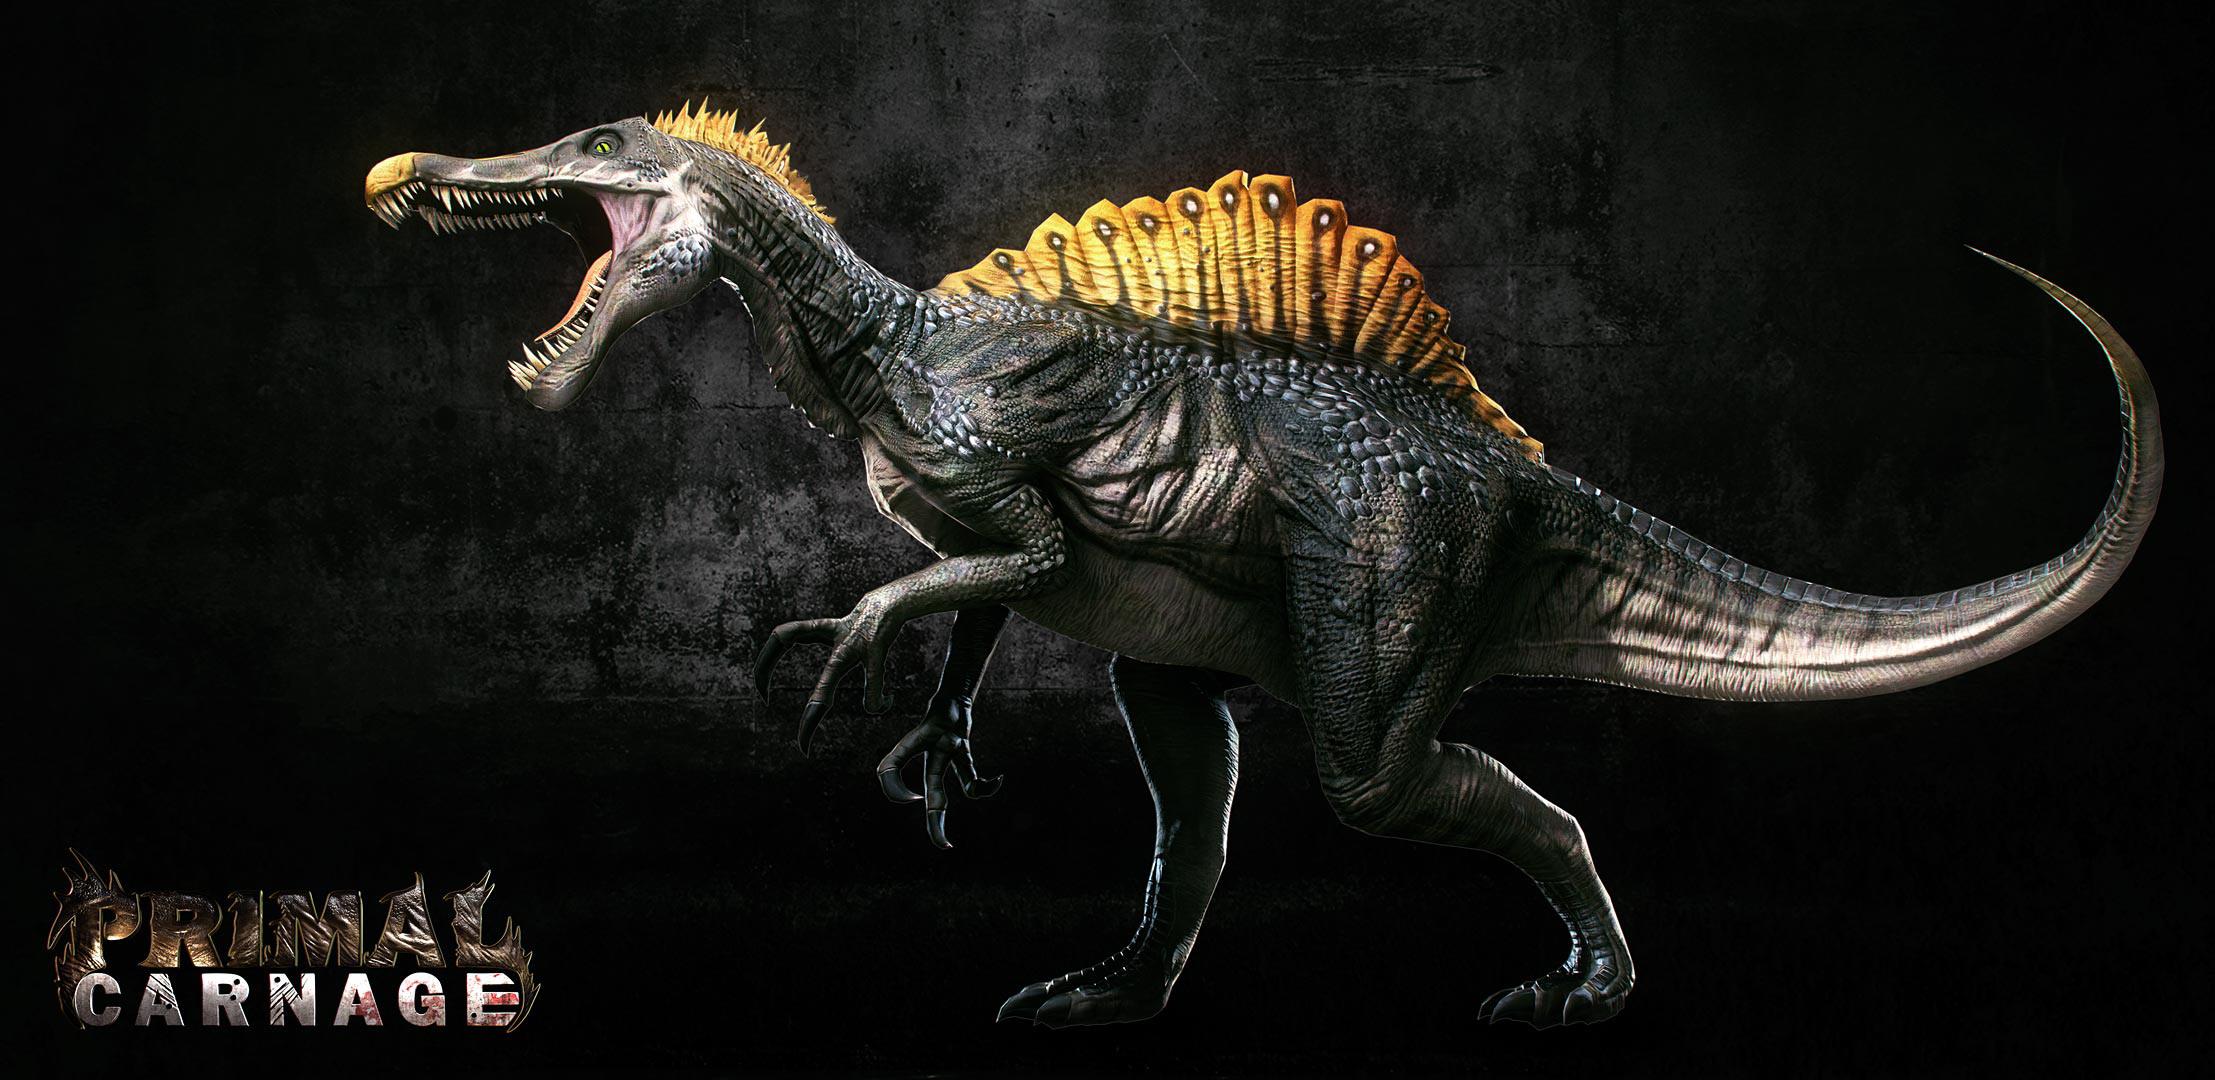 PRIMAL CARNAGE fantasy dinosaur g wallpaper 2215x1080 169025 2215x1080